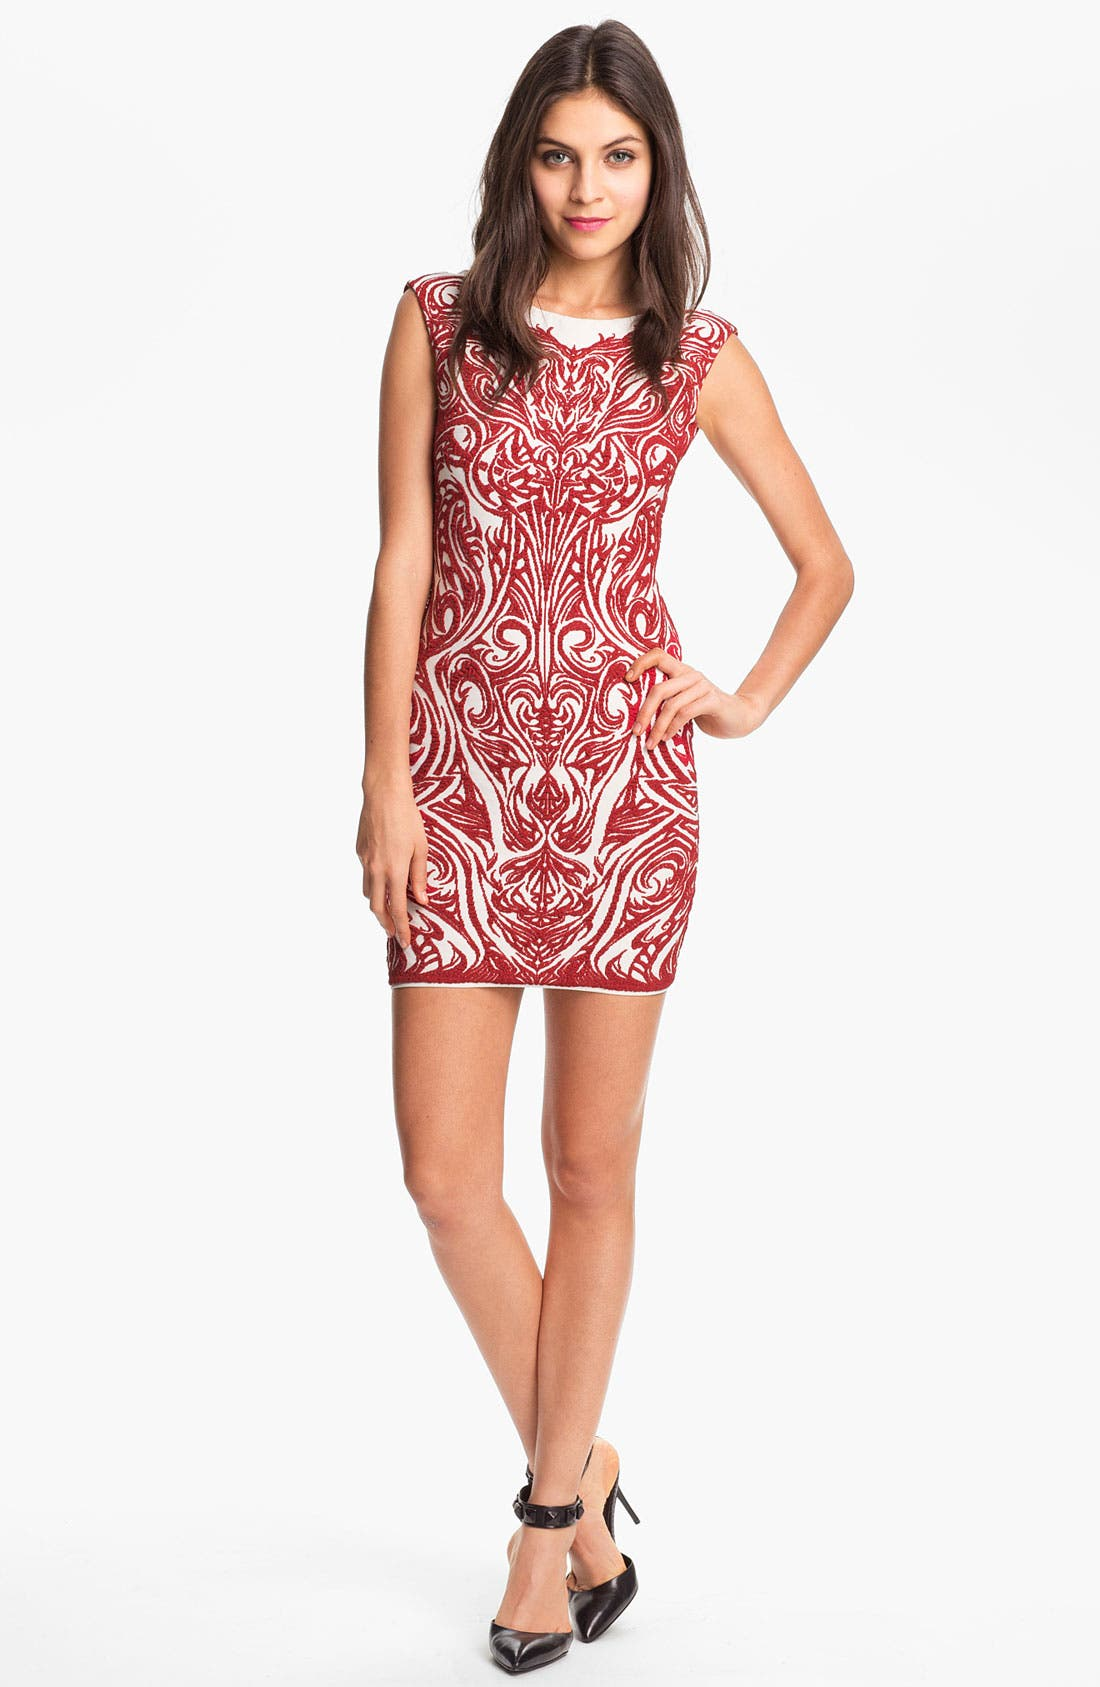 Alternate Image 1 Selected - RVN 'Phoenix' Embroidered Jacquard Minidress